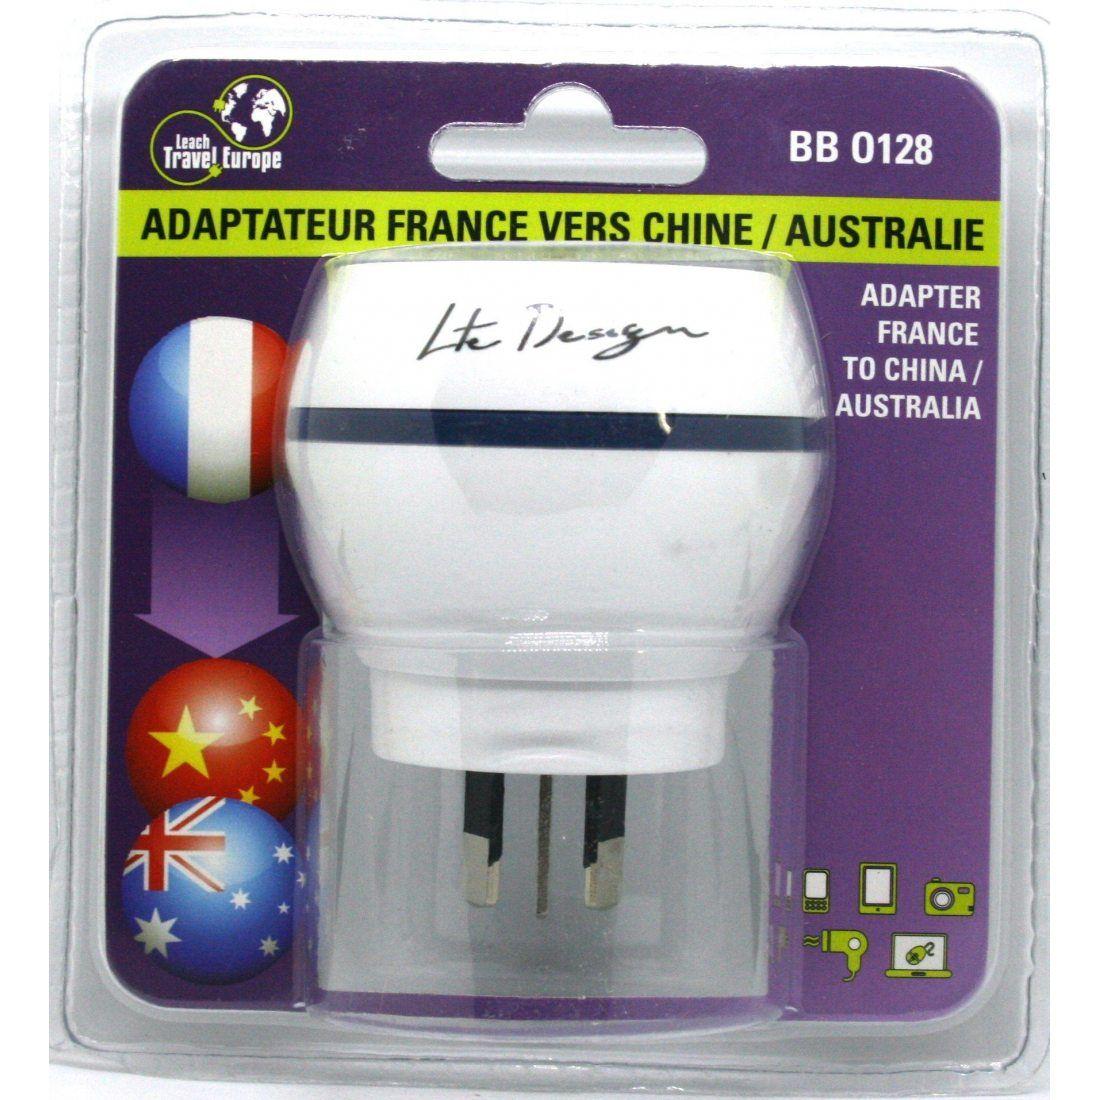 Adaptateur De Voyage France Vers Australie/Chine - Gamme Bulle- BB0128 - LTE Design - Leach Travel Europe